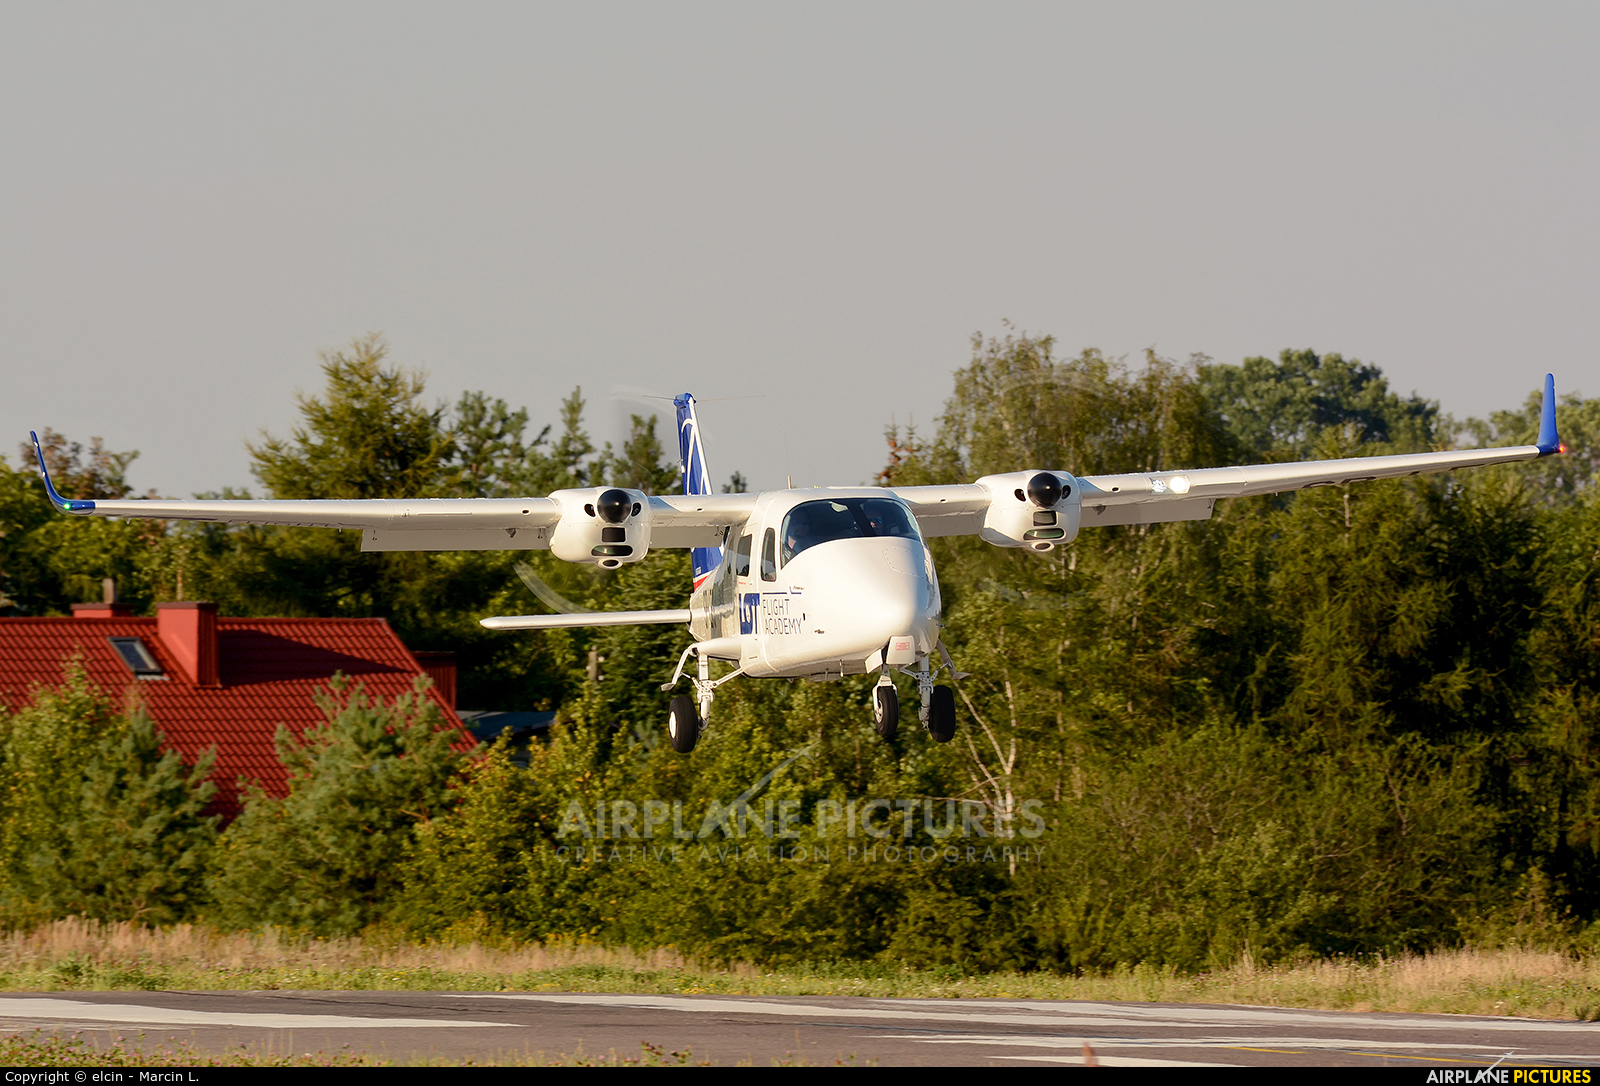 LOT Flight Academy SP-LFG aircraft at Piotrków Trybunalski